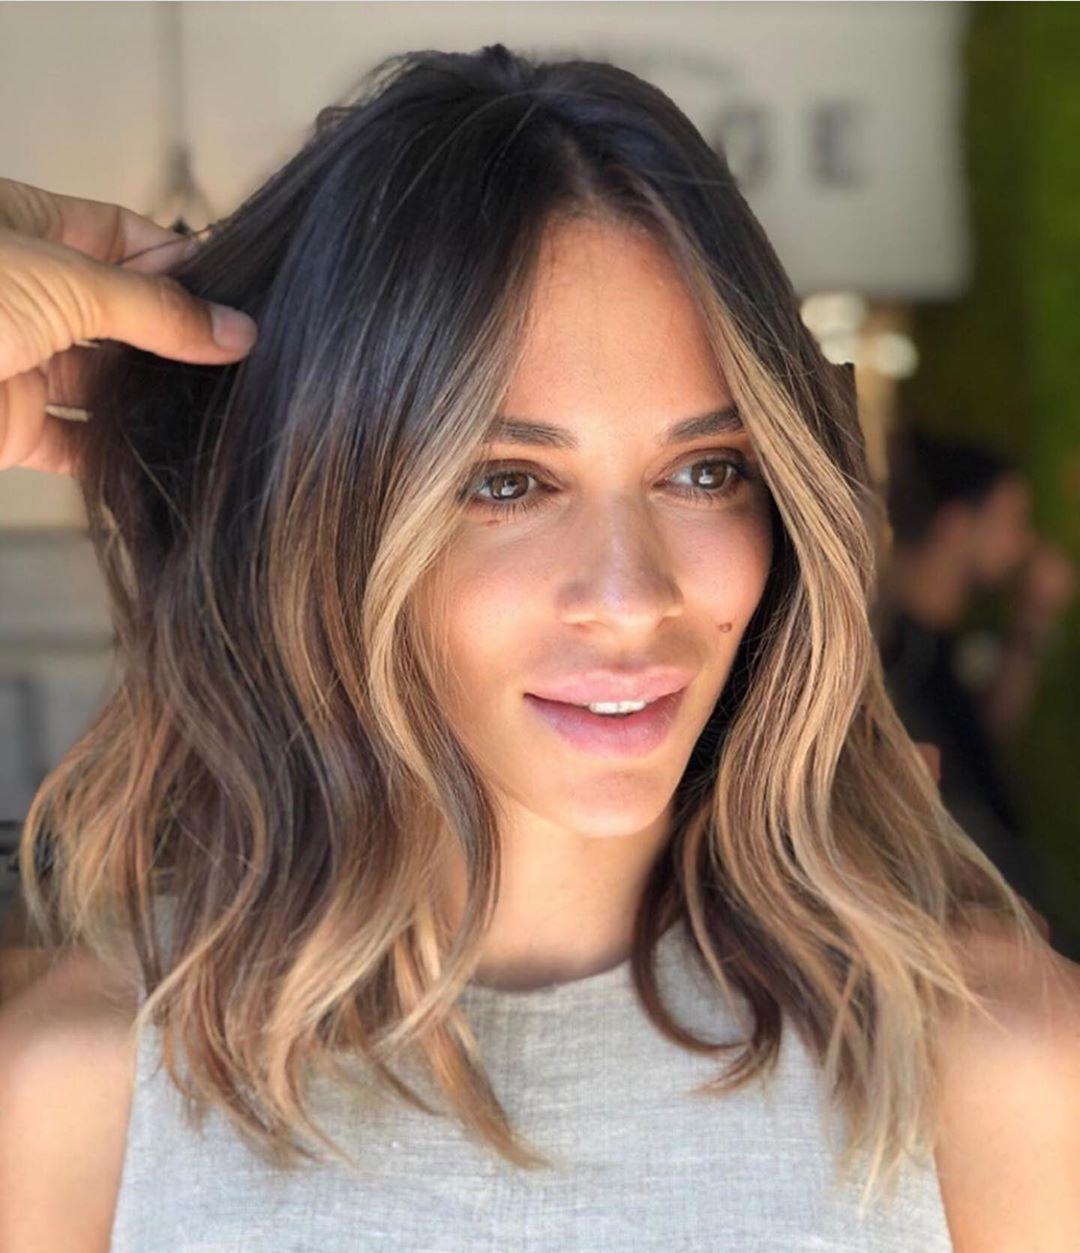 "Enissablog on Instagram: ""What's your favorite🤩#long or short hair#blonde o...,  #Enissablog #favoritelong #hairblonde #Instagram #Short #Whats #Hairstyles for medium length hair Enissablog on Instagram: ""What's your favorite🤩#long or short hair#blonde o...,  #Enissablog ..."